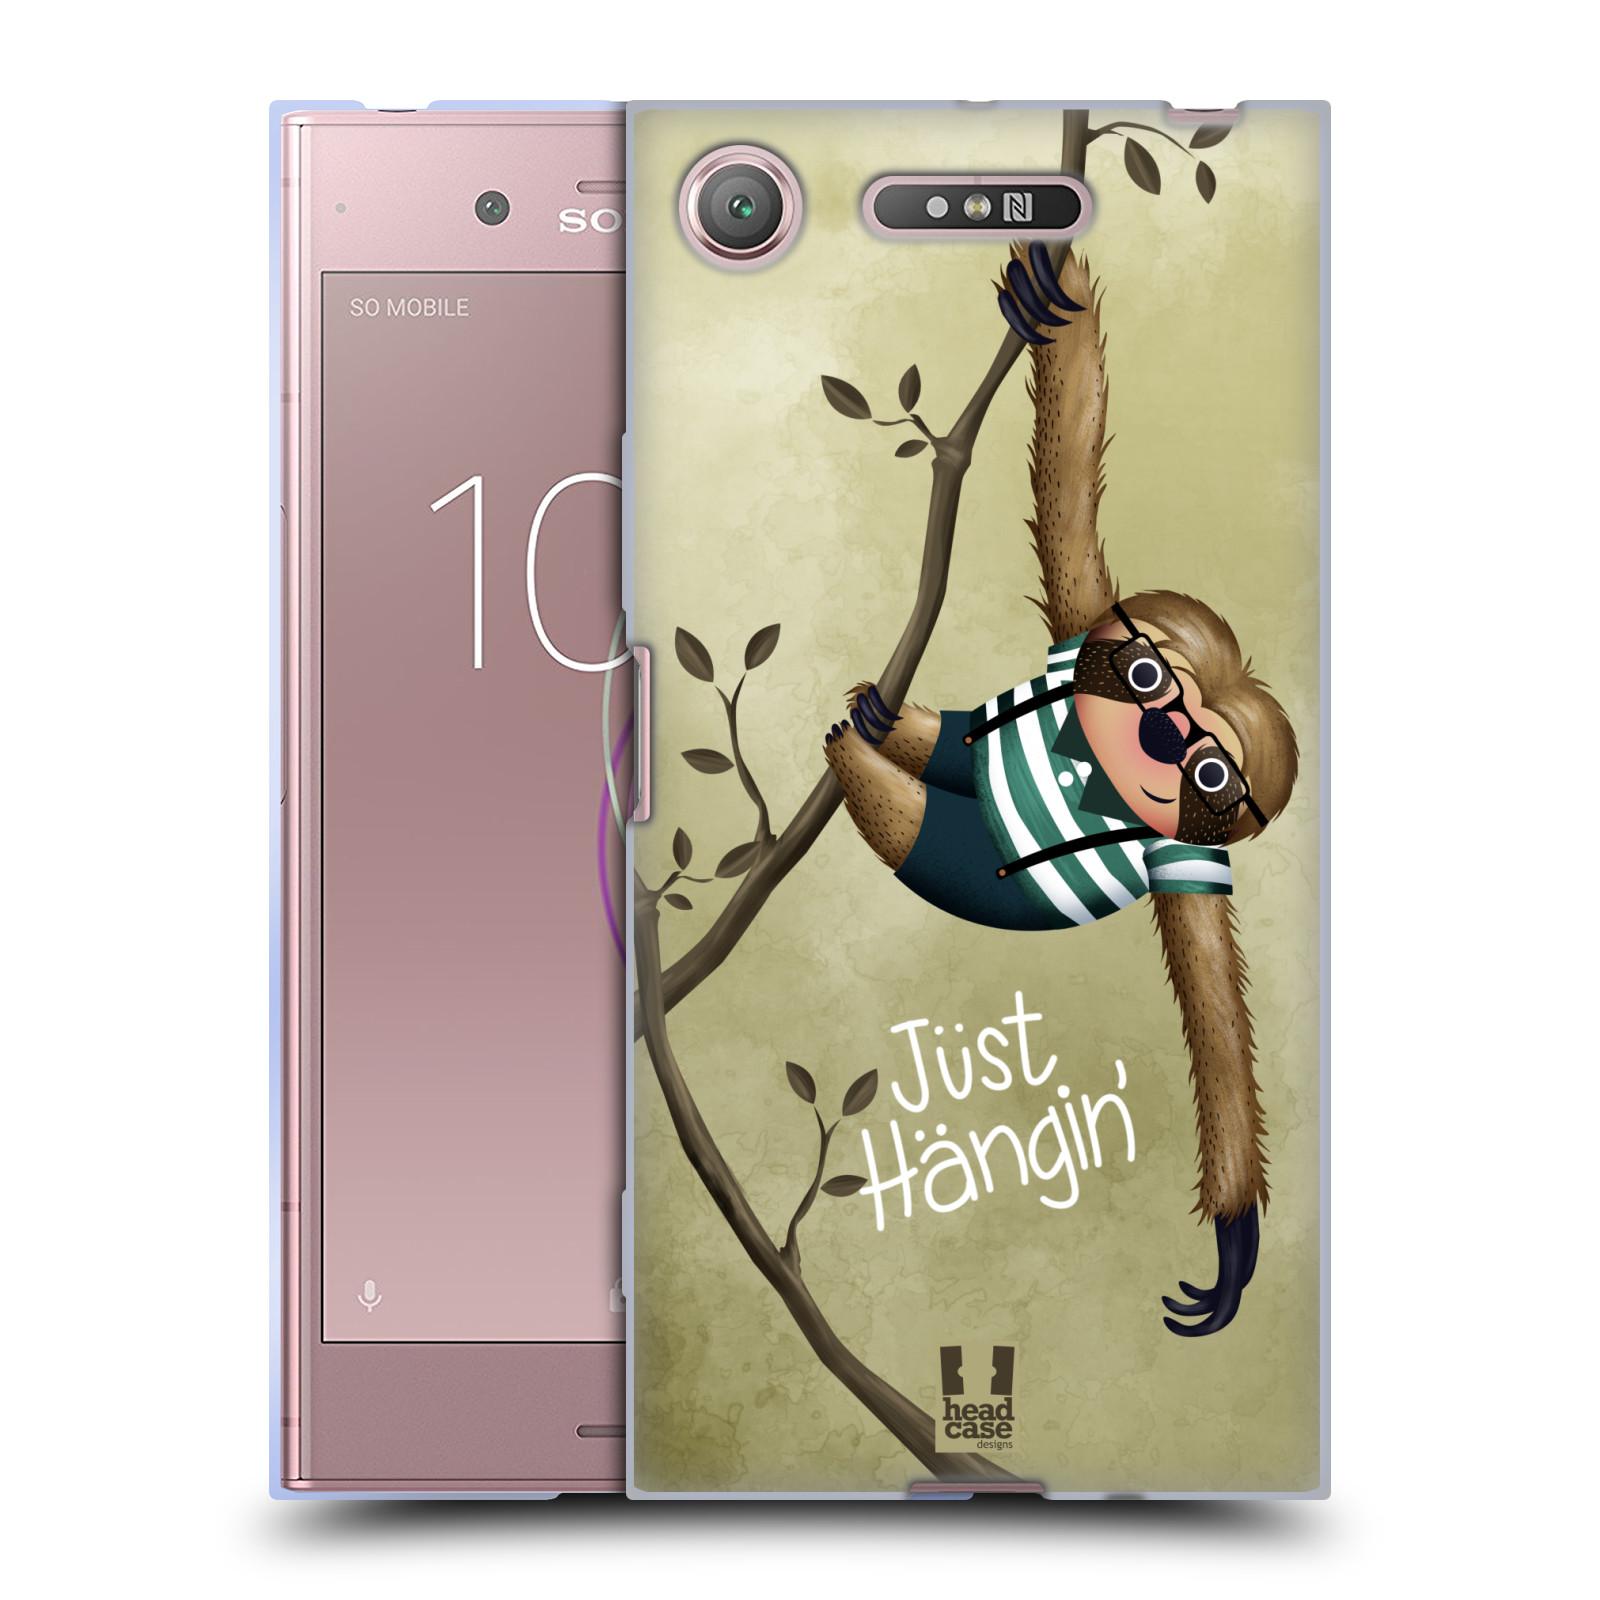 Silikonové pouzdro na mobil Sony Xperia XZ1 - Head Case - Lenochod Just Hangin